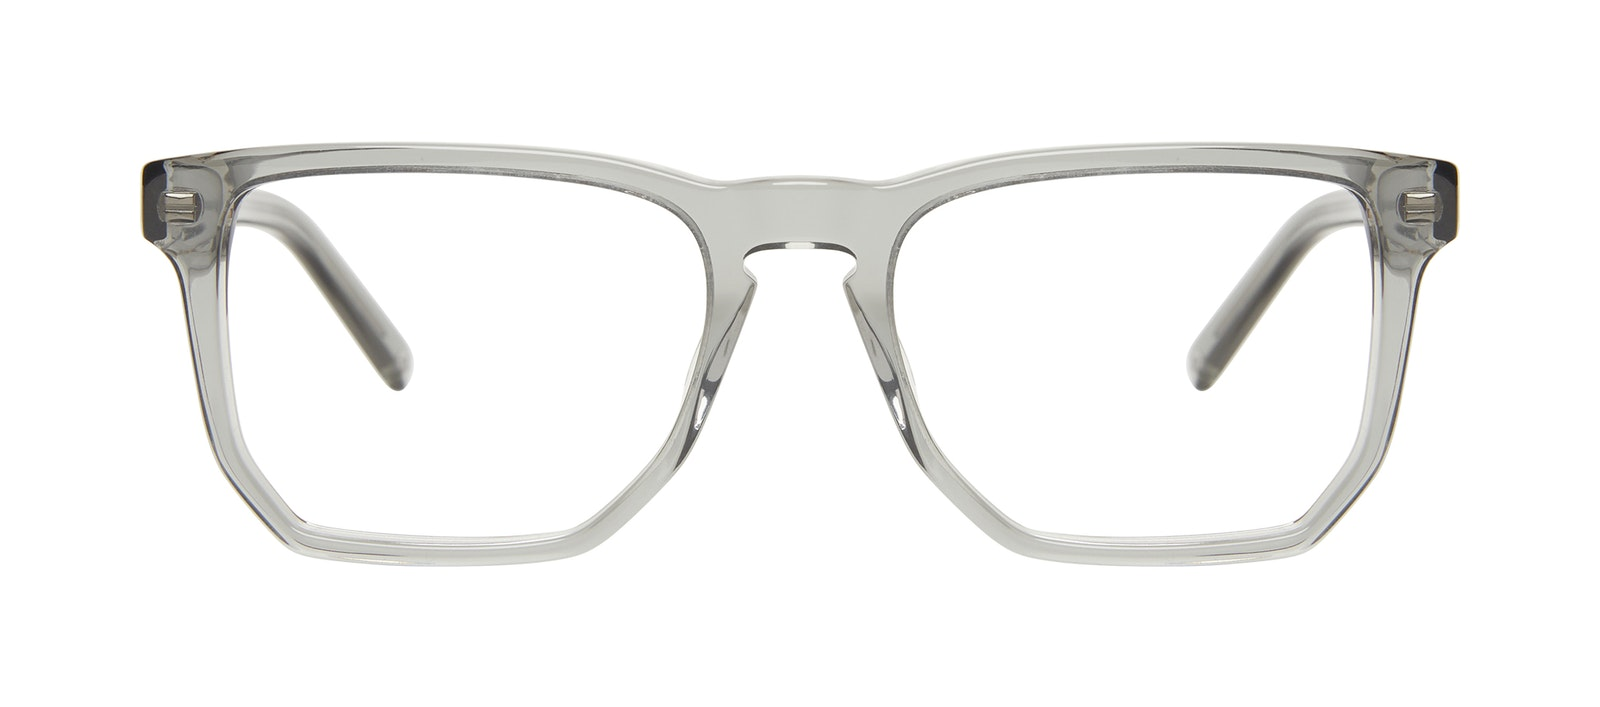 Affordable Fashion Glasses Square Eyeglasses Men Andy Storm Front